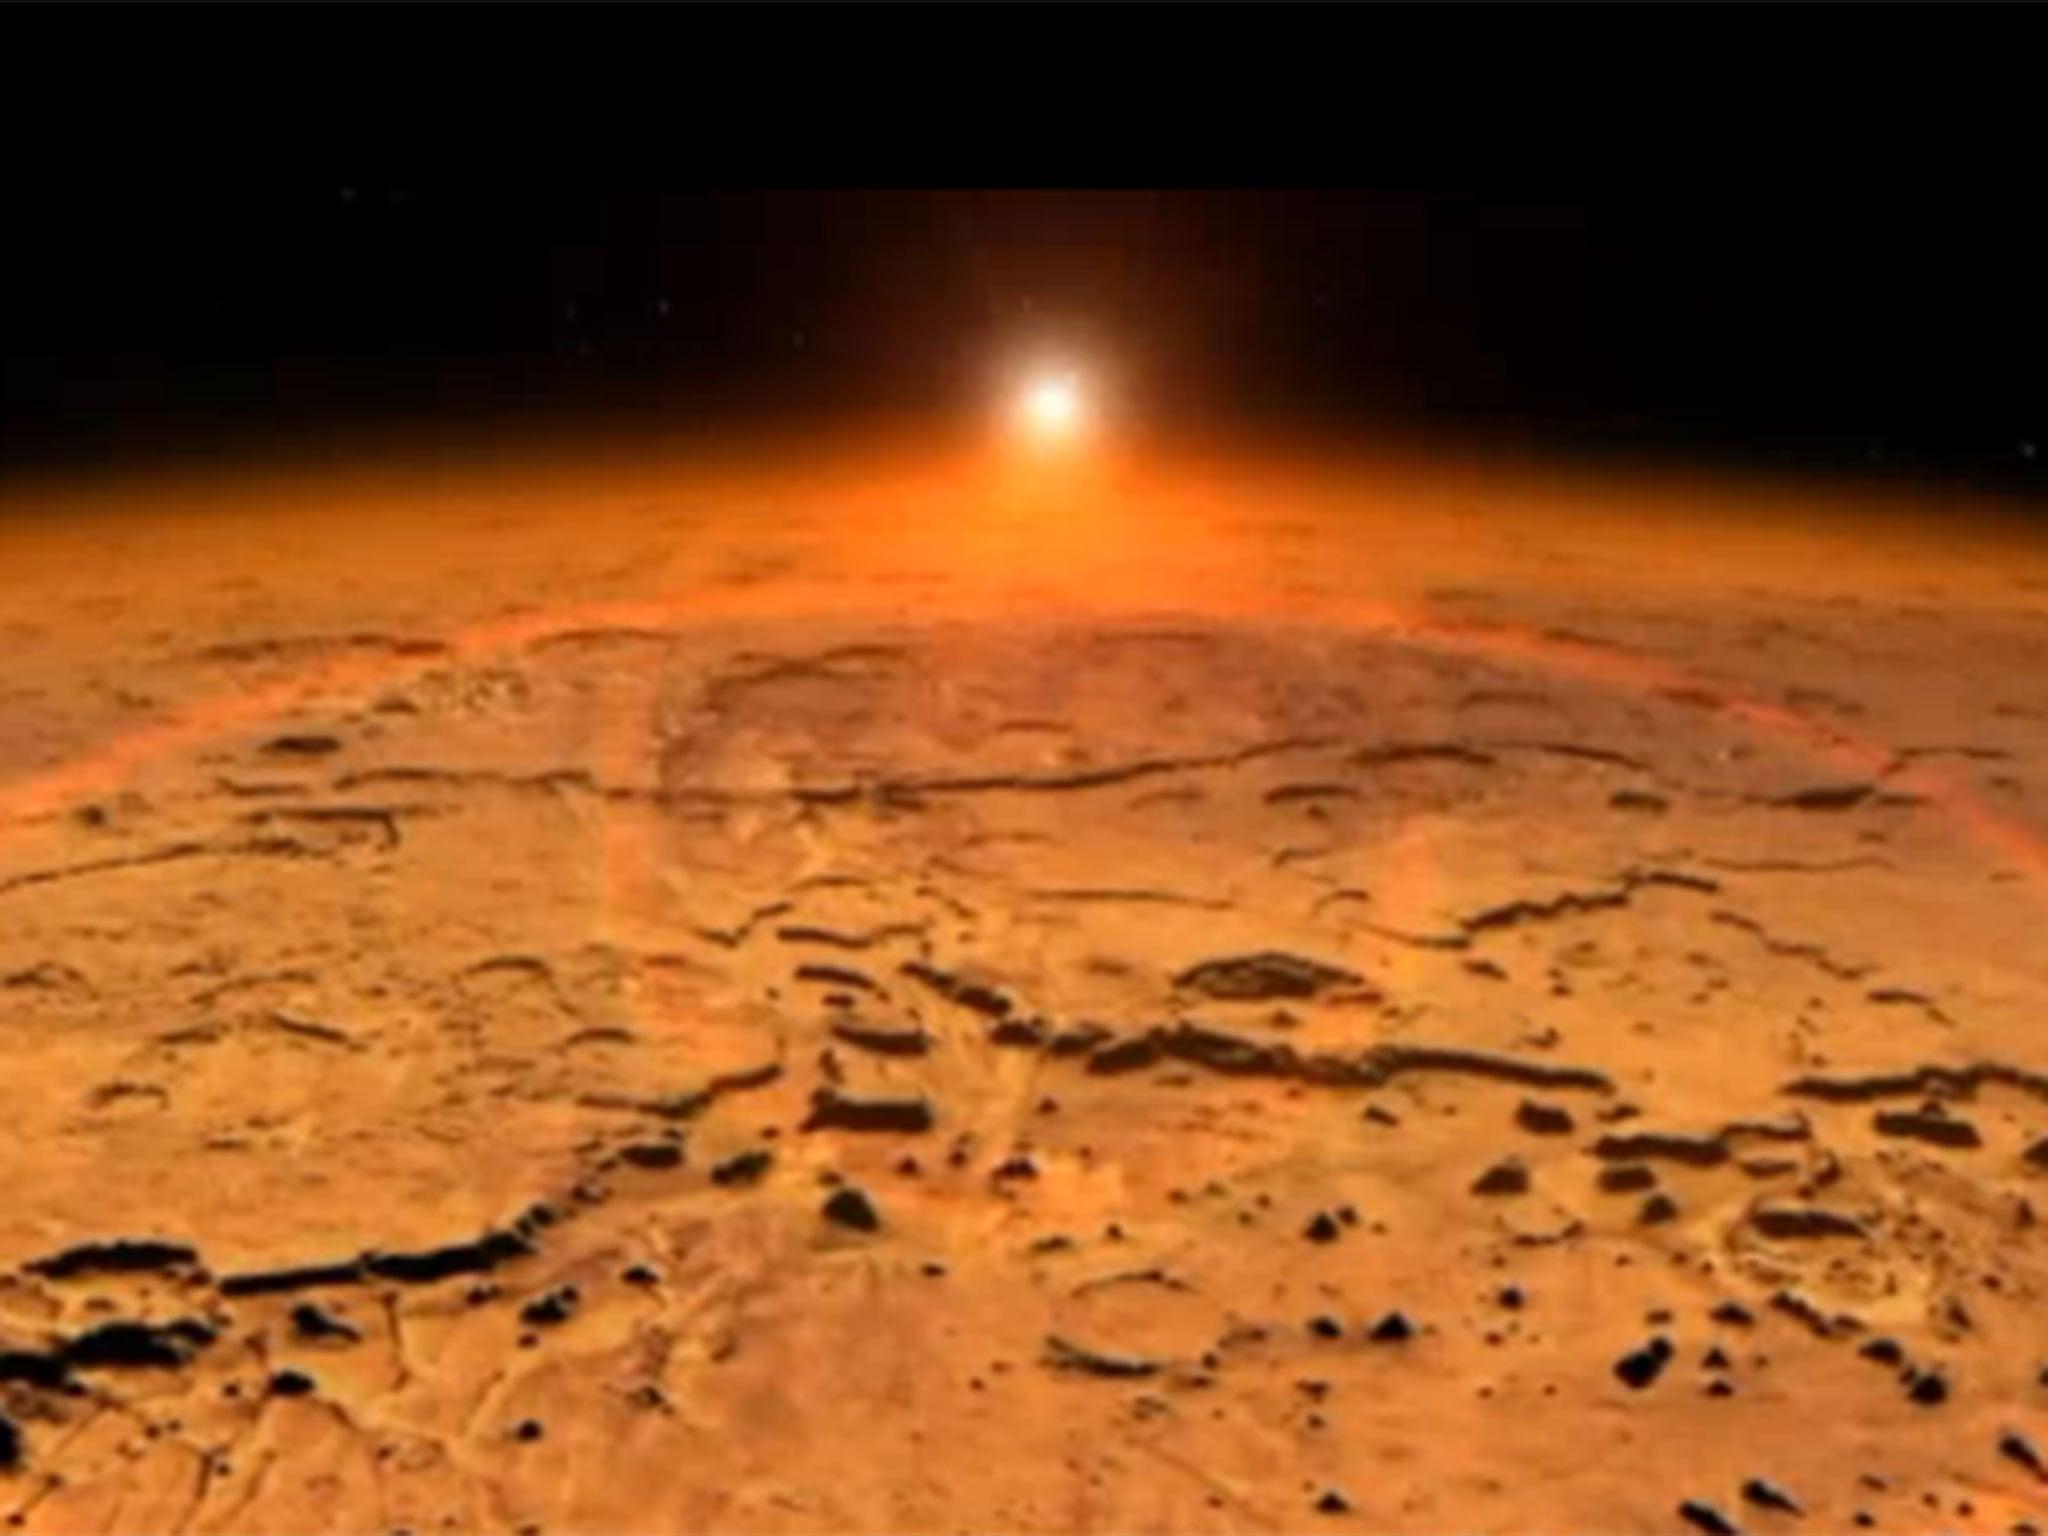 NASA's MAVEN spacecraft enters orbit around Mars | The Independent